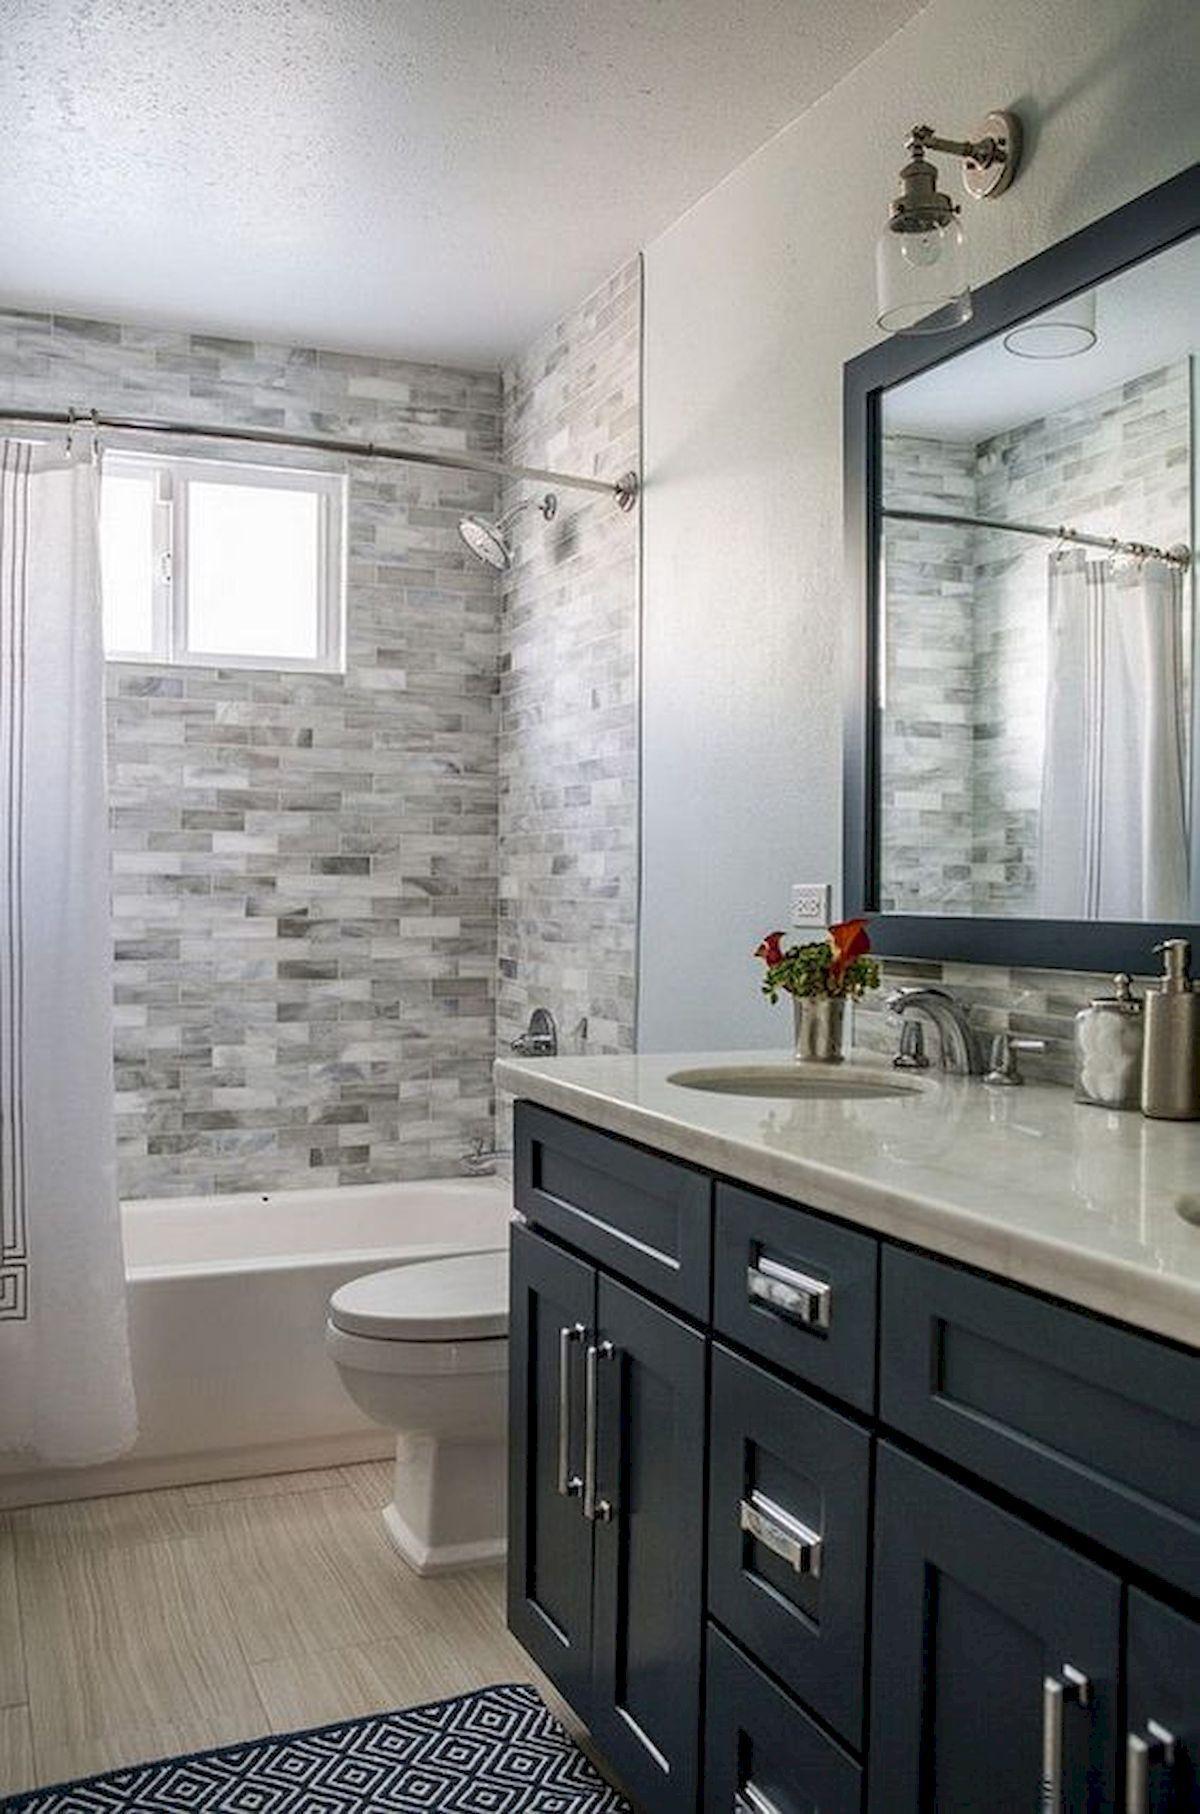 60 Elegant Small Master Bathroom Remodel Ideas 42 Dreambathrooms Small Bathroom Remodel Bathroom Remodel Master Small Bathroom Decor